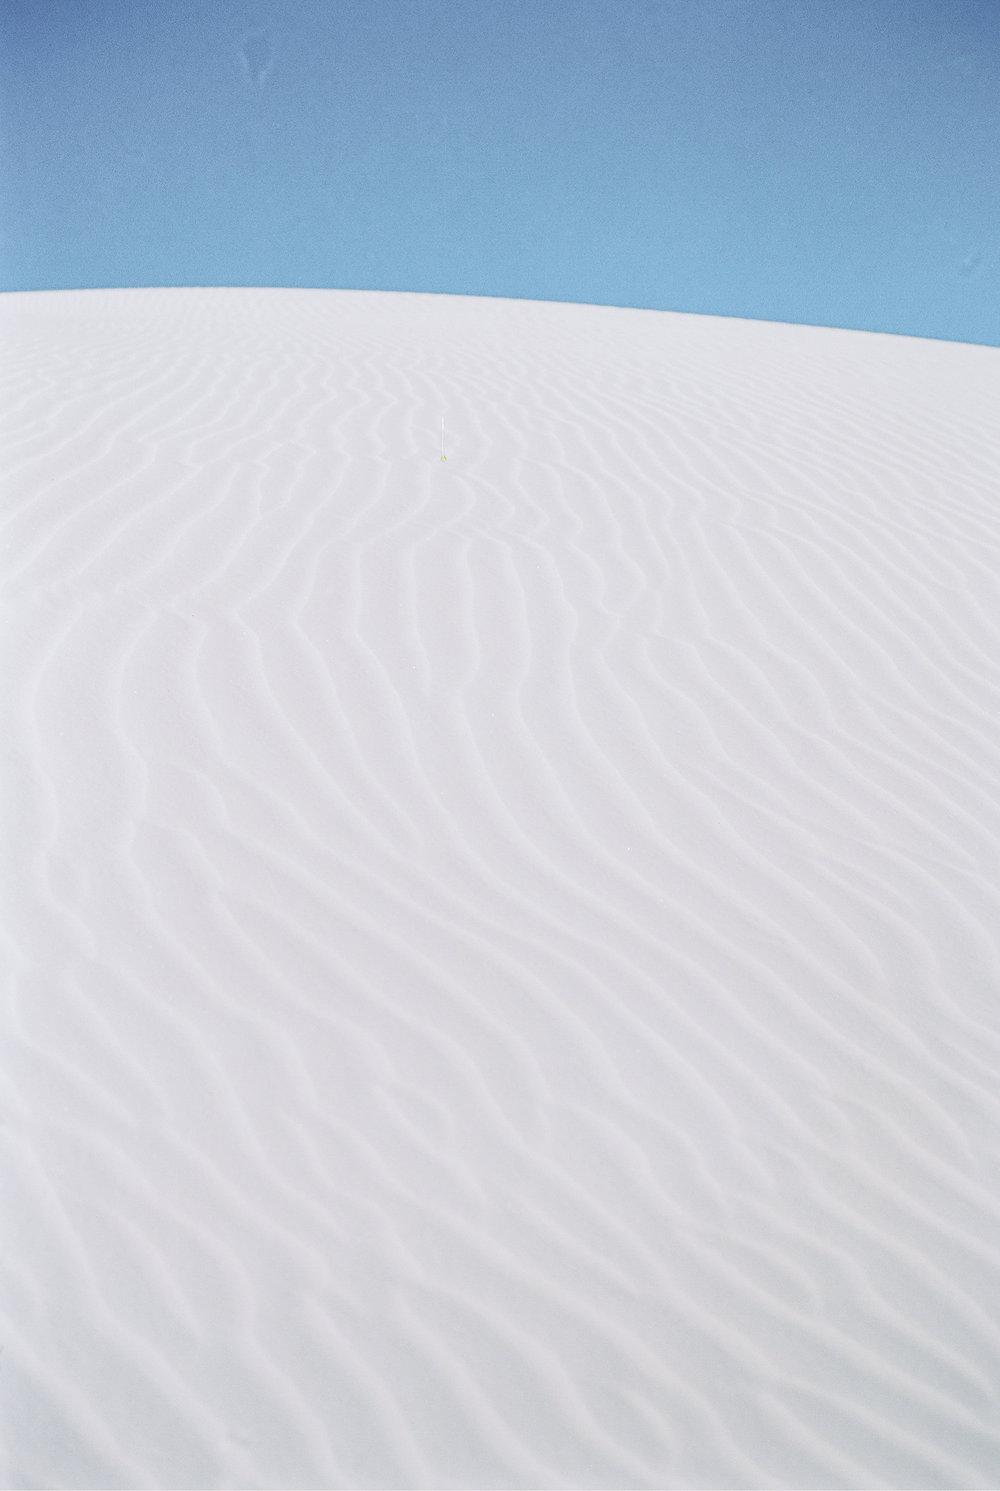 White Sands National Monument // Laura Goldenberger